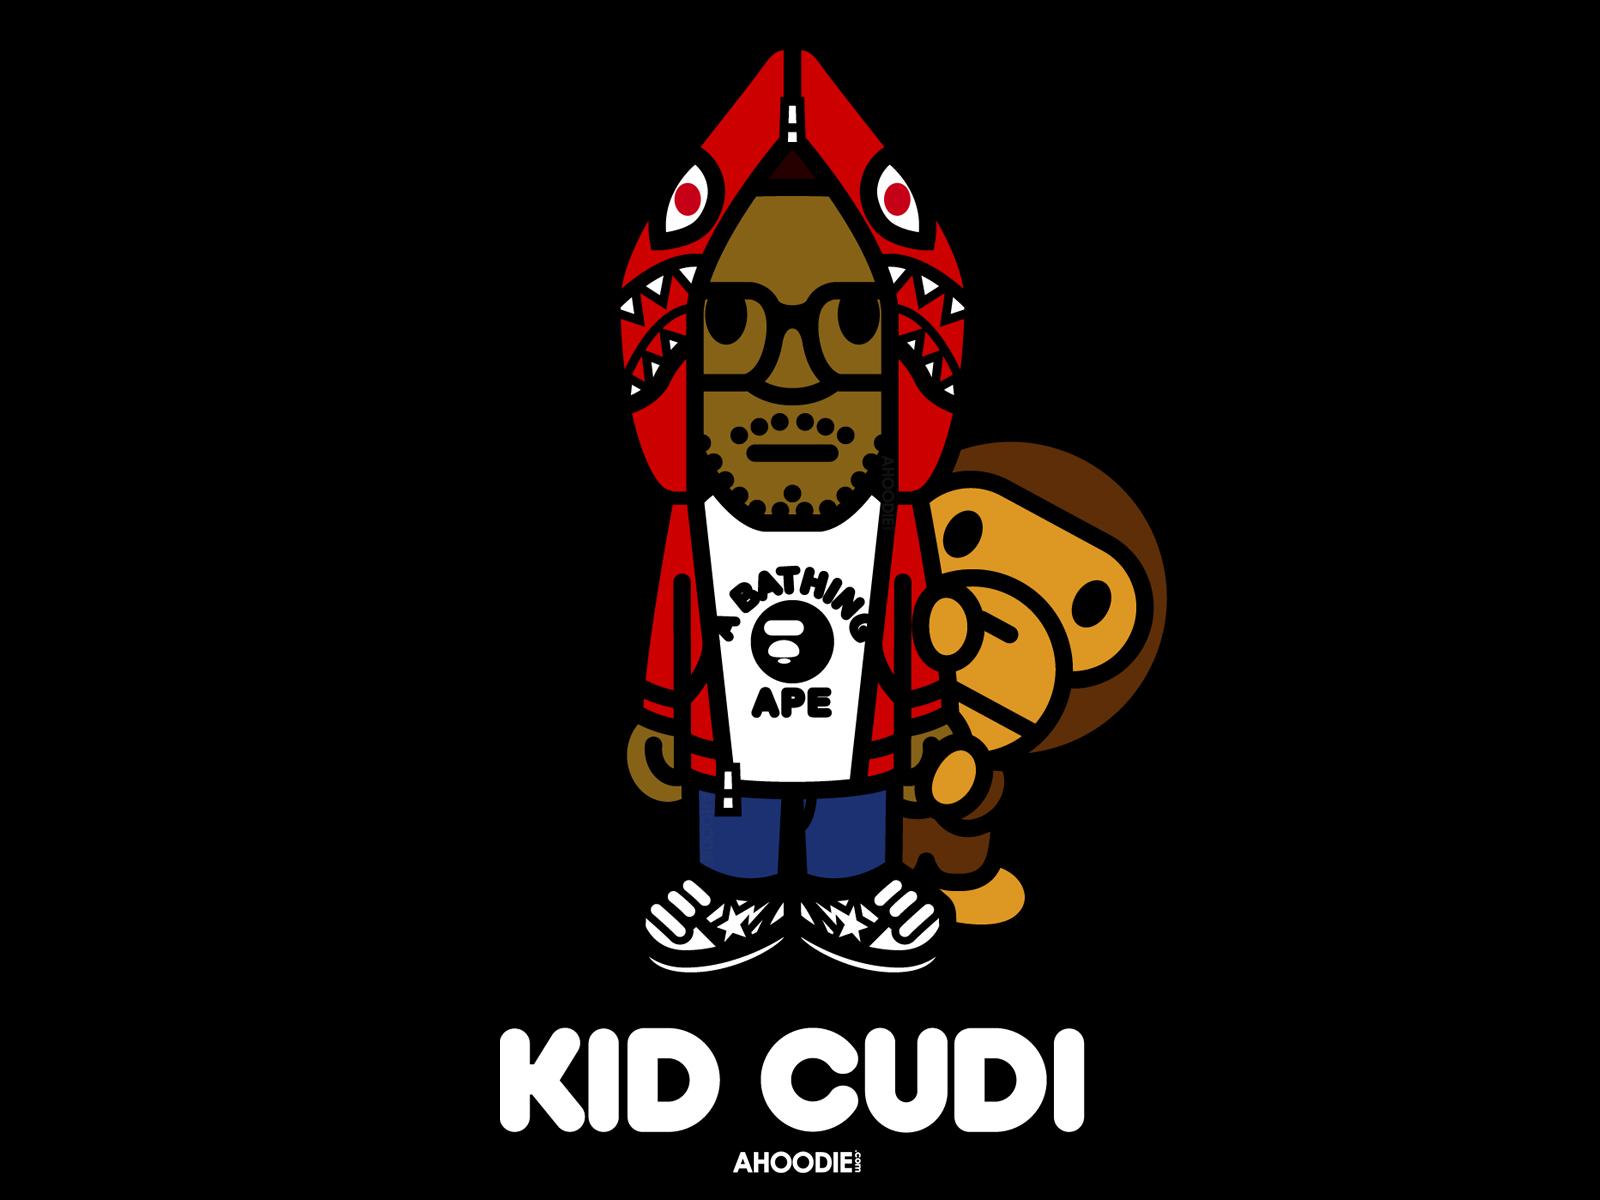 Download Kid Cudi x BAPE Wallpapers Dat New Cudi 1600x1200